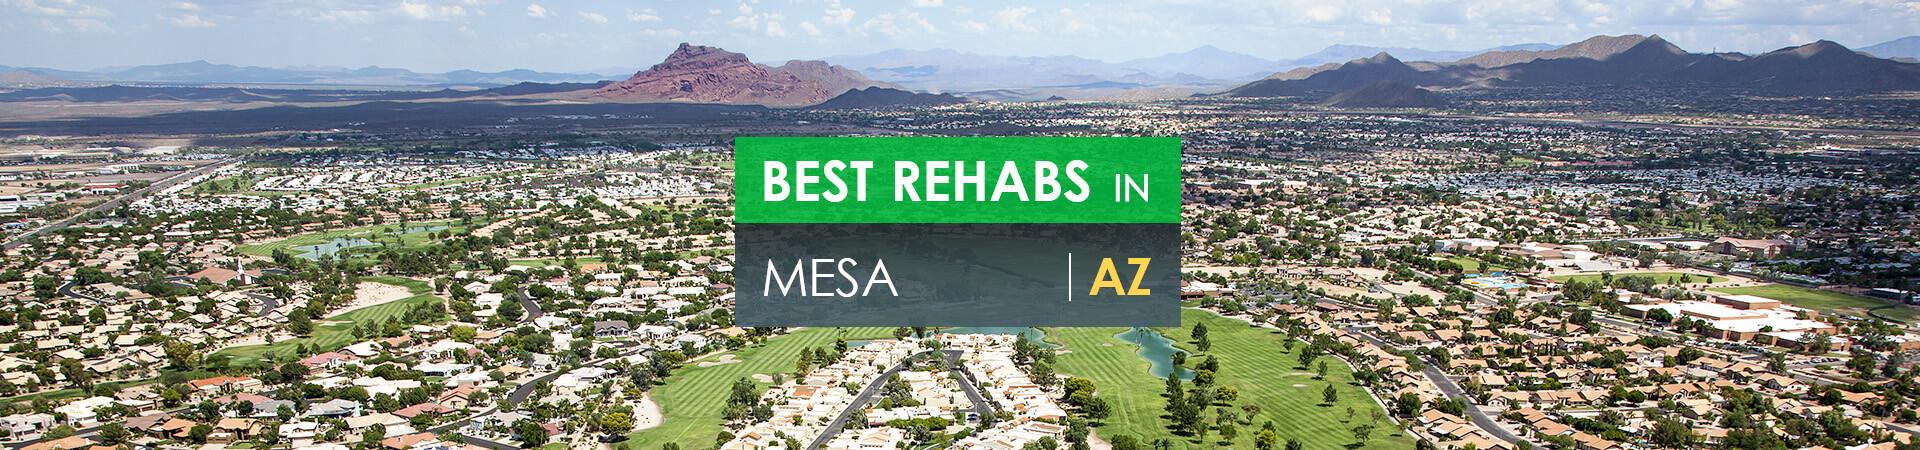 Best rehabs in Mesa, AZ